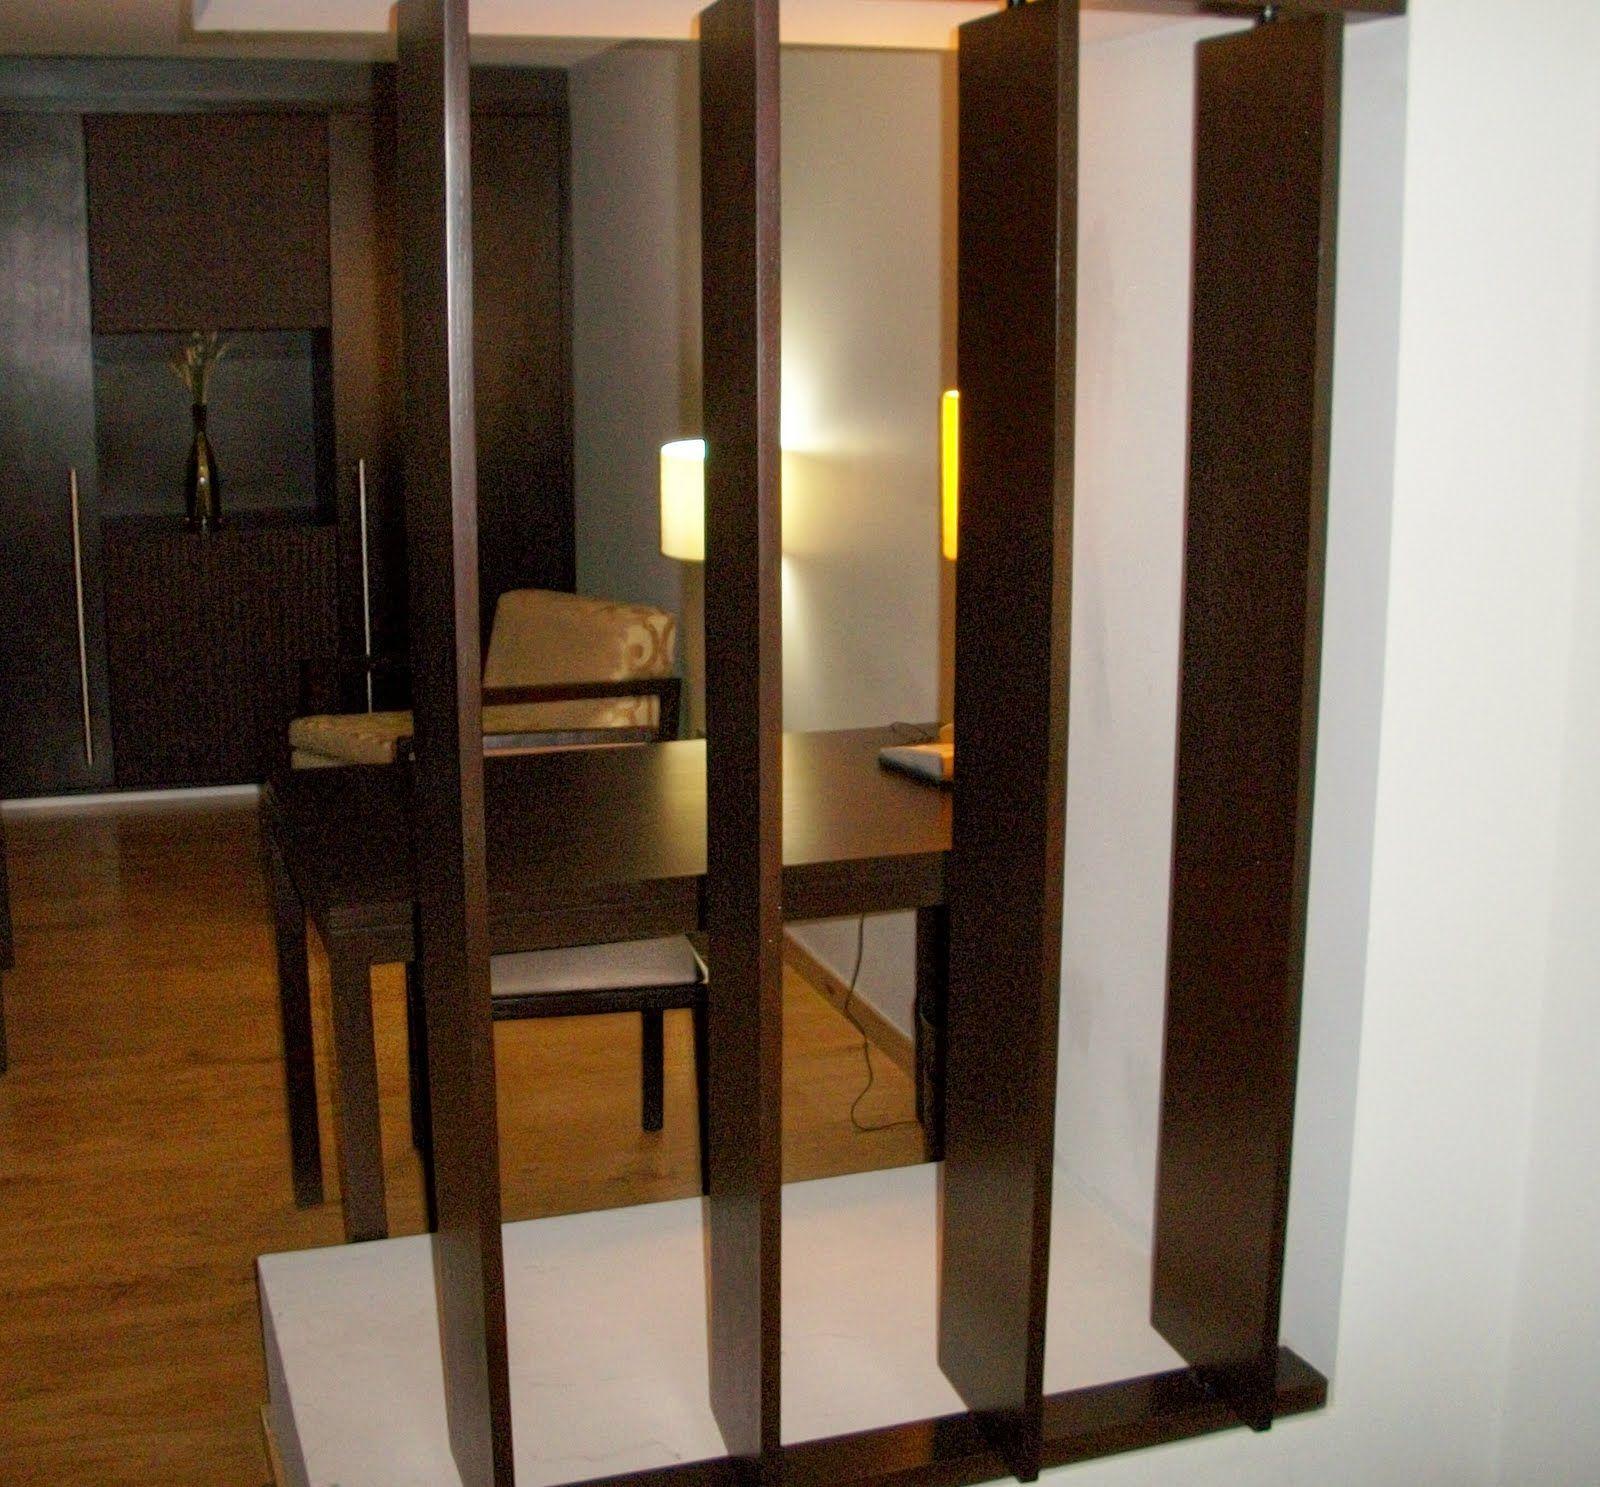 loft room divider ideas panels turn to let light through or rh pinterest es